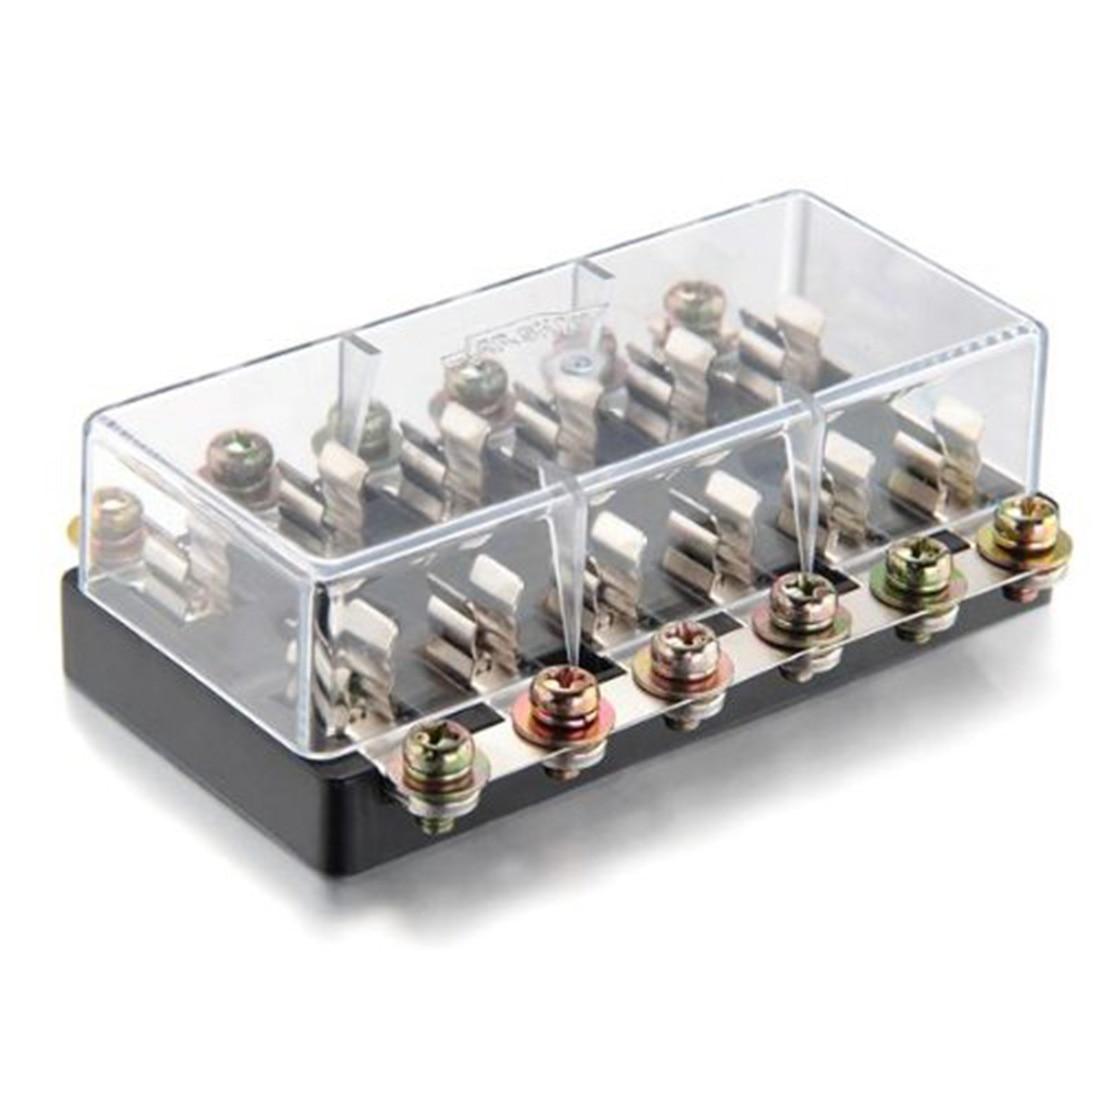 small resolution of dewtreetali new universal 12v 6 way fusebox fuse blade fuse box fuseholder kit car boat